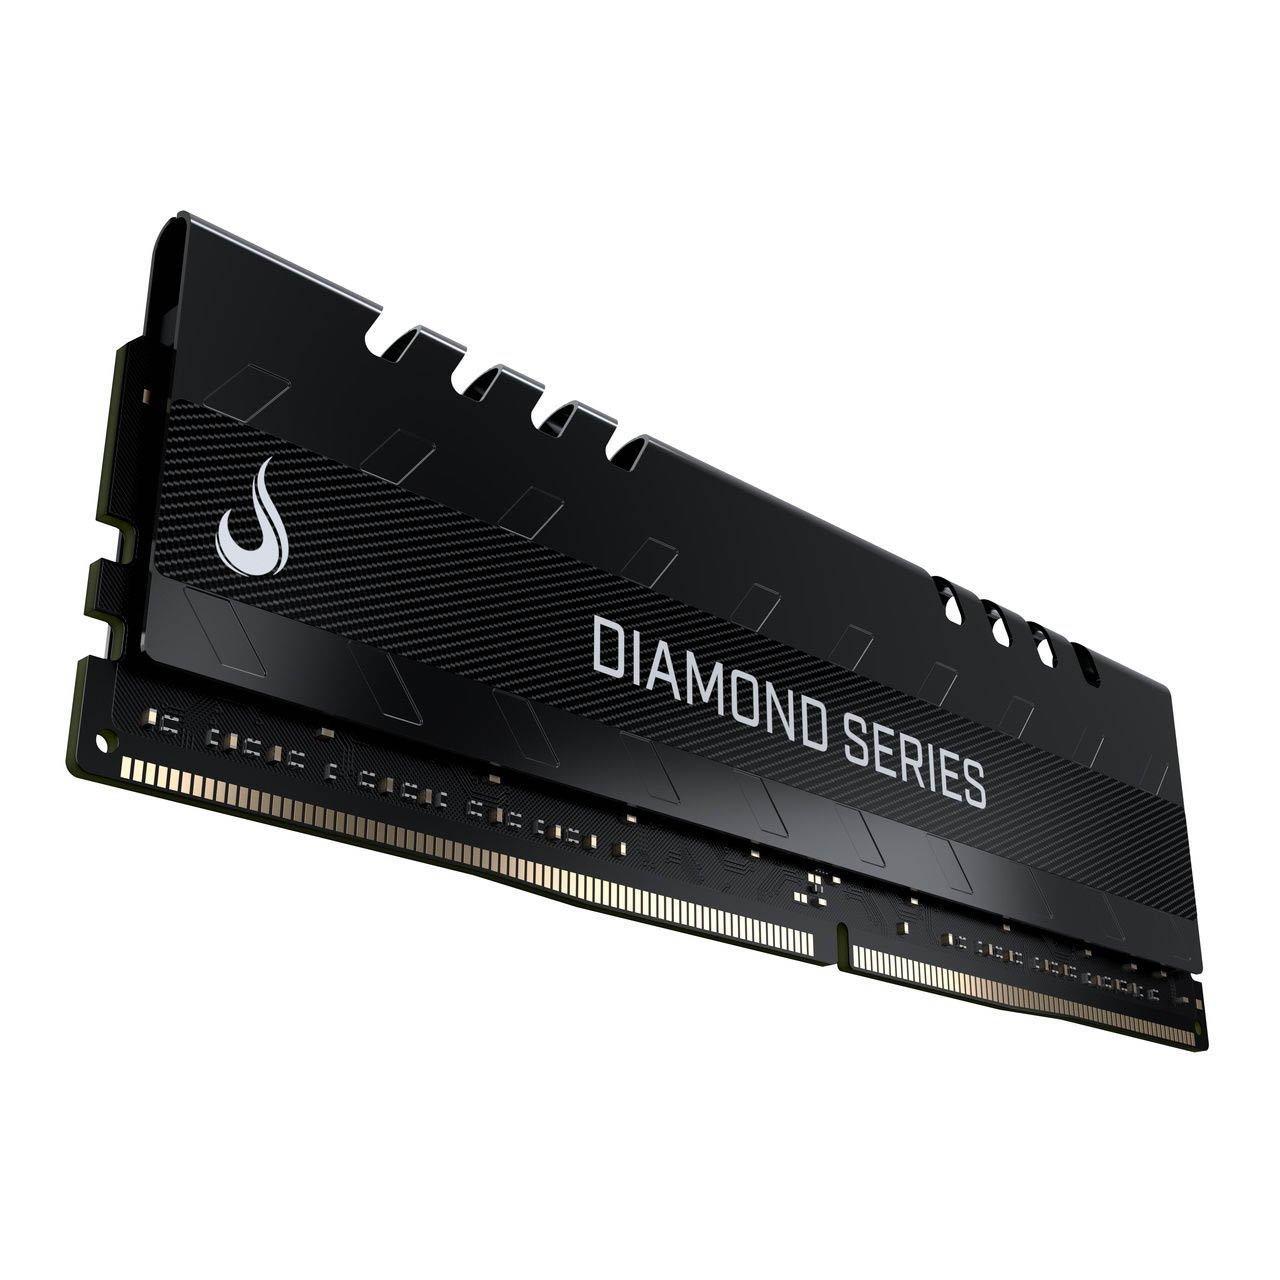 memoria ddr4 4gb pc2400 risemode diamond series black 51506 2000 204388 1